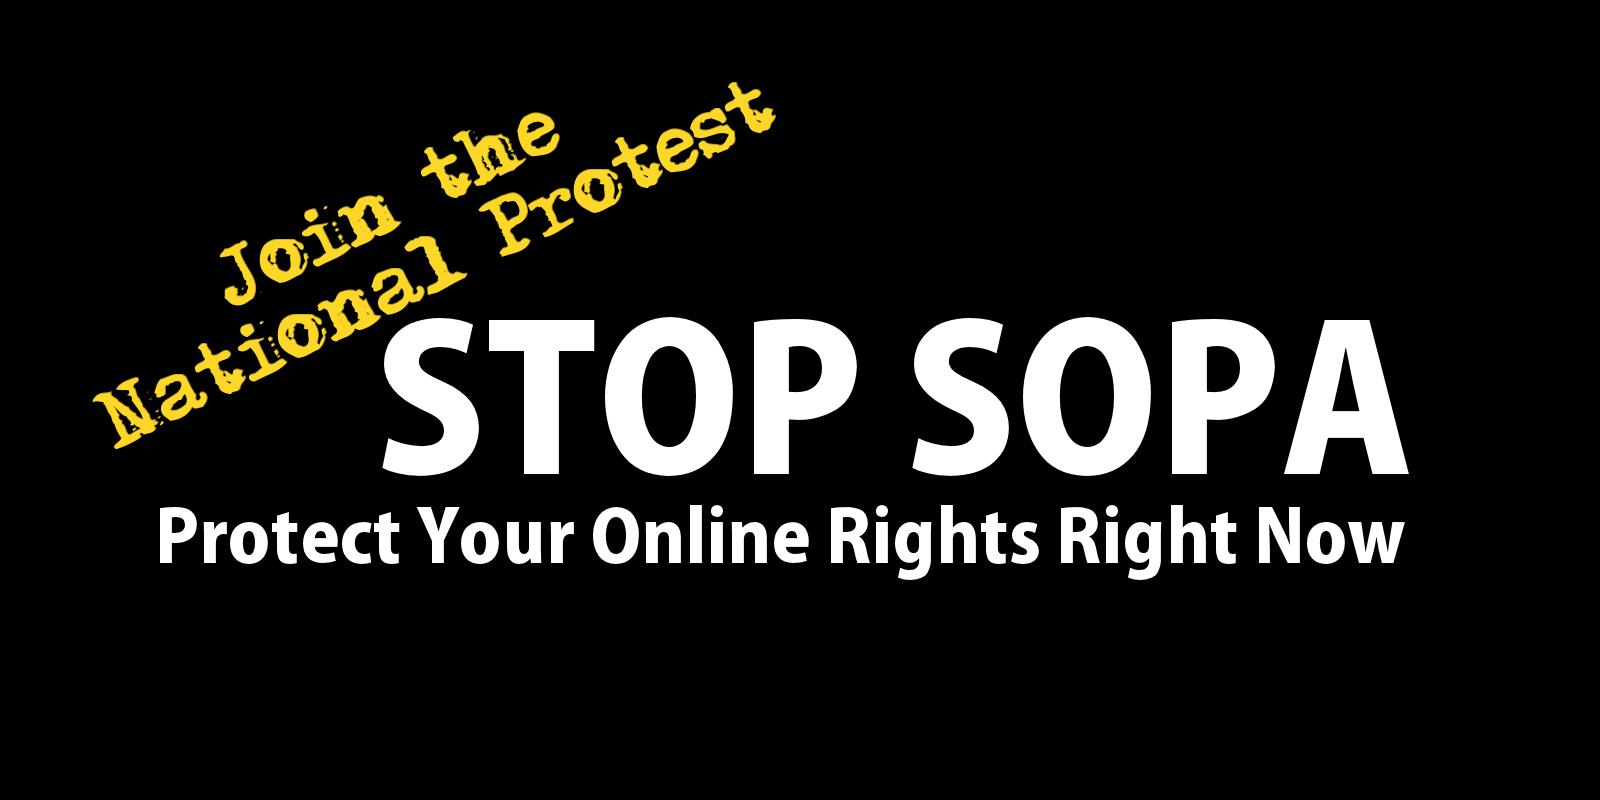 stop-sopa-protest!